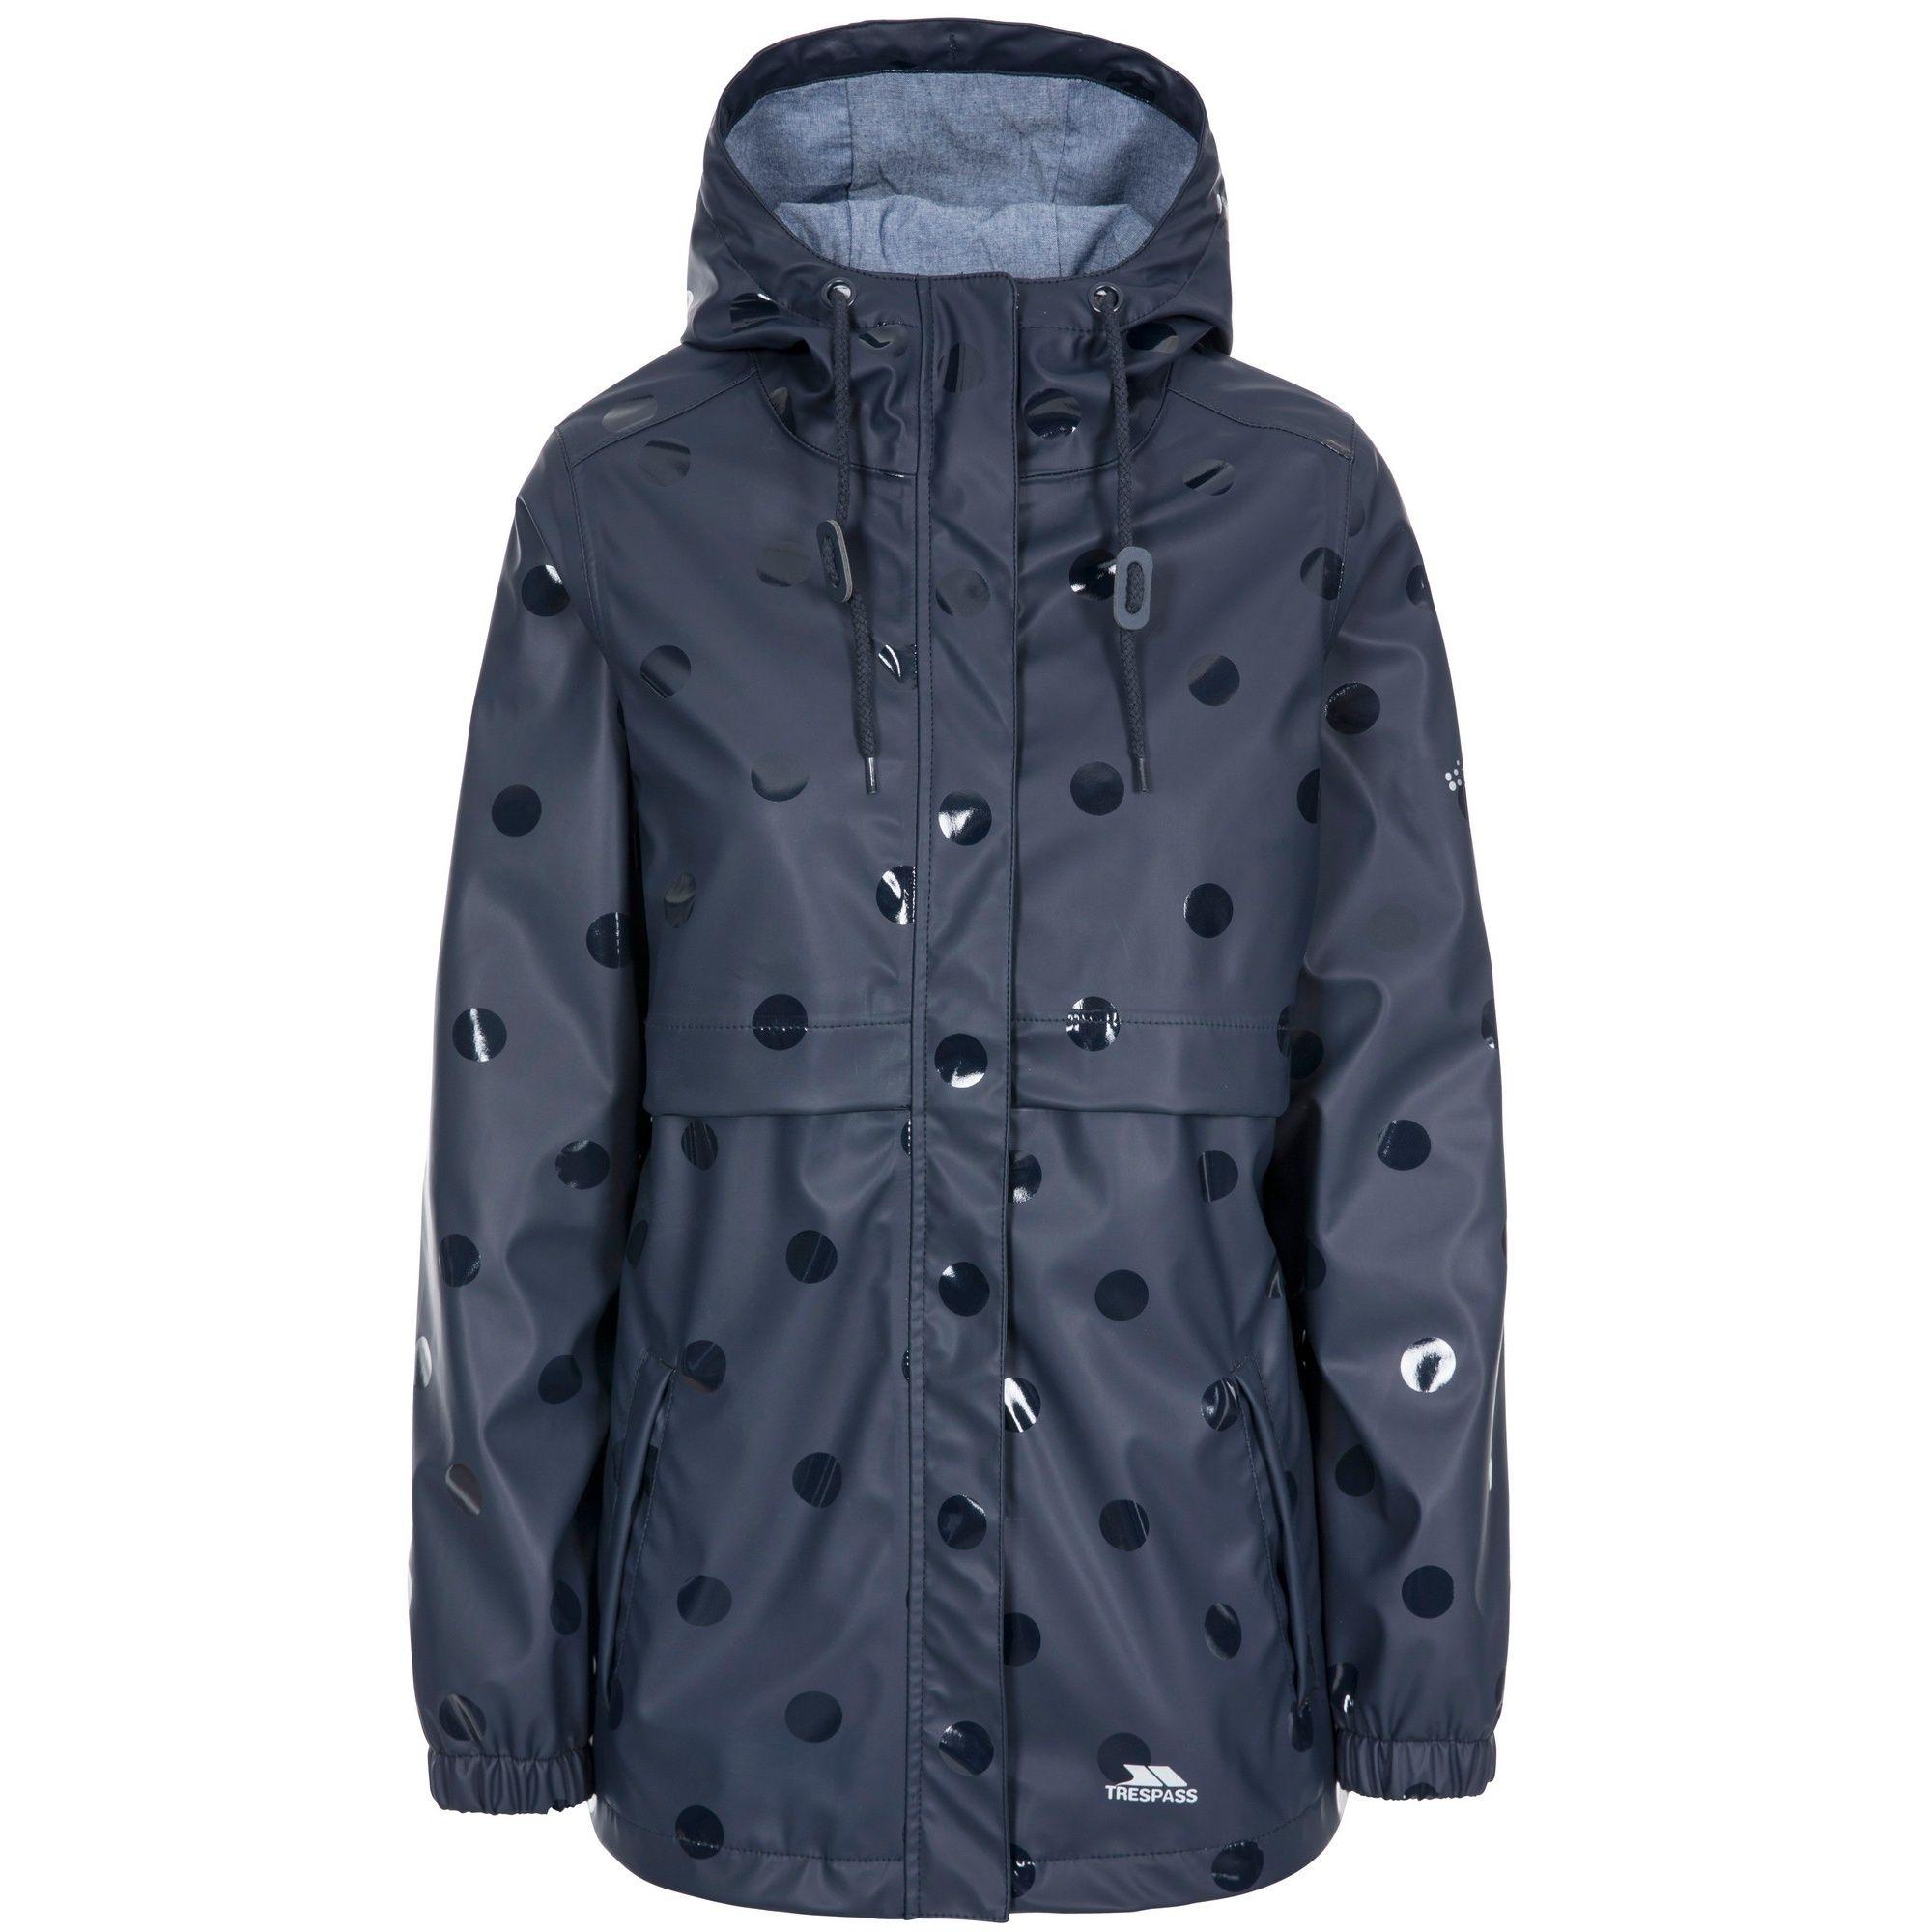 Trespass Womens/Ladies Farewell Waterproof Jacket